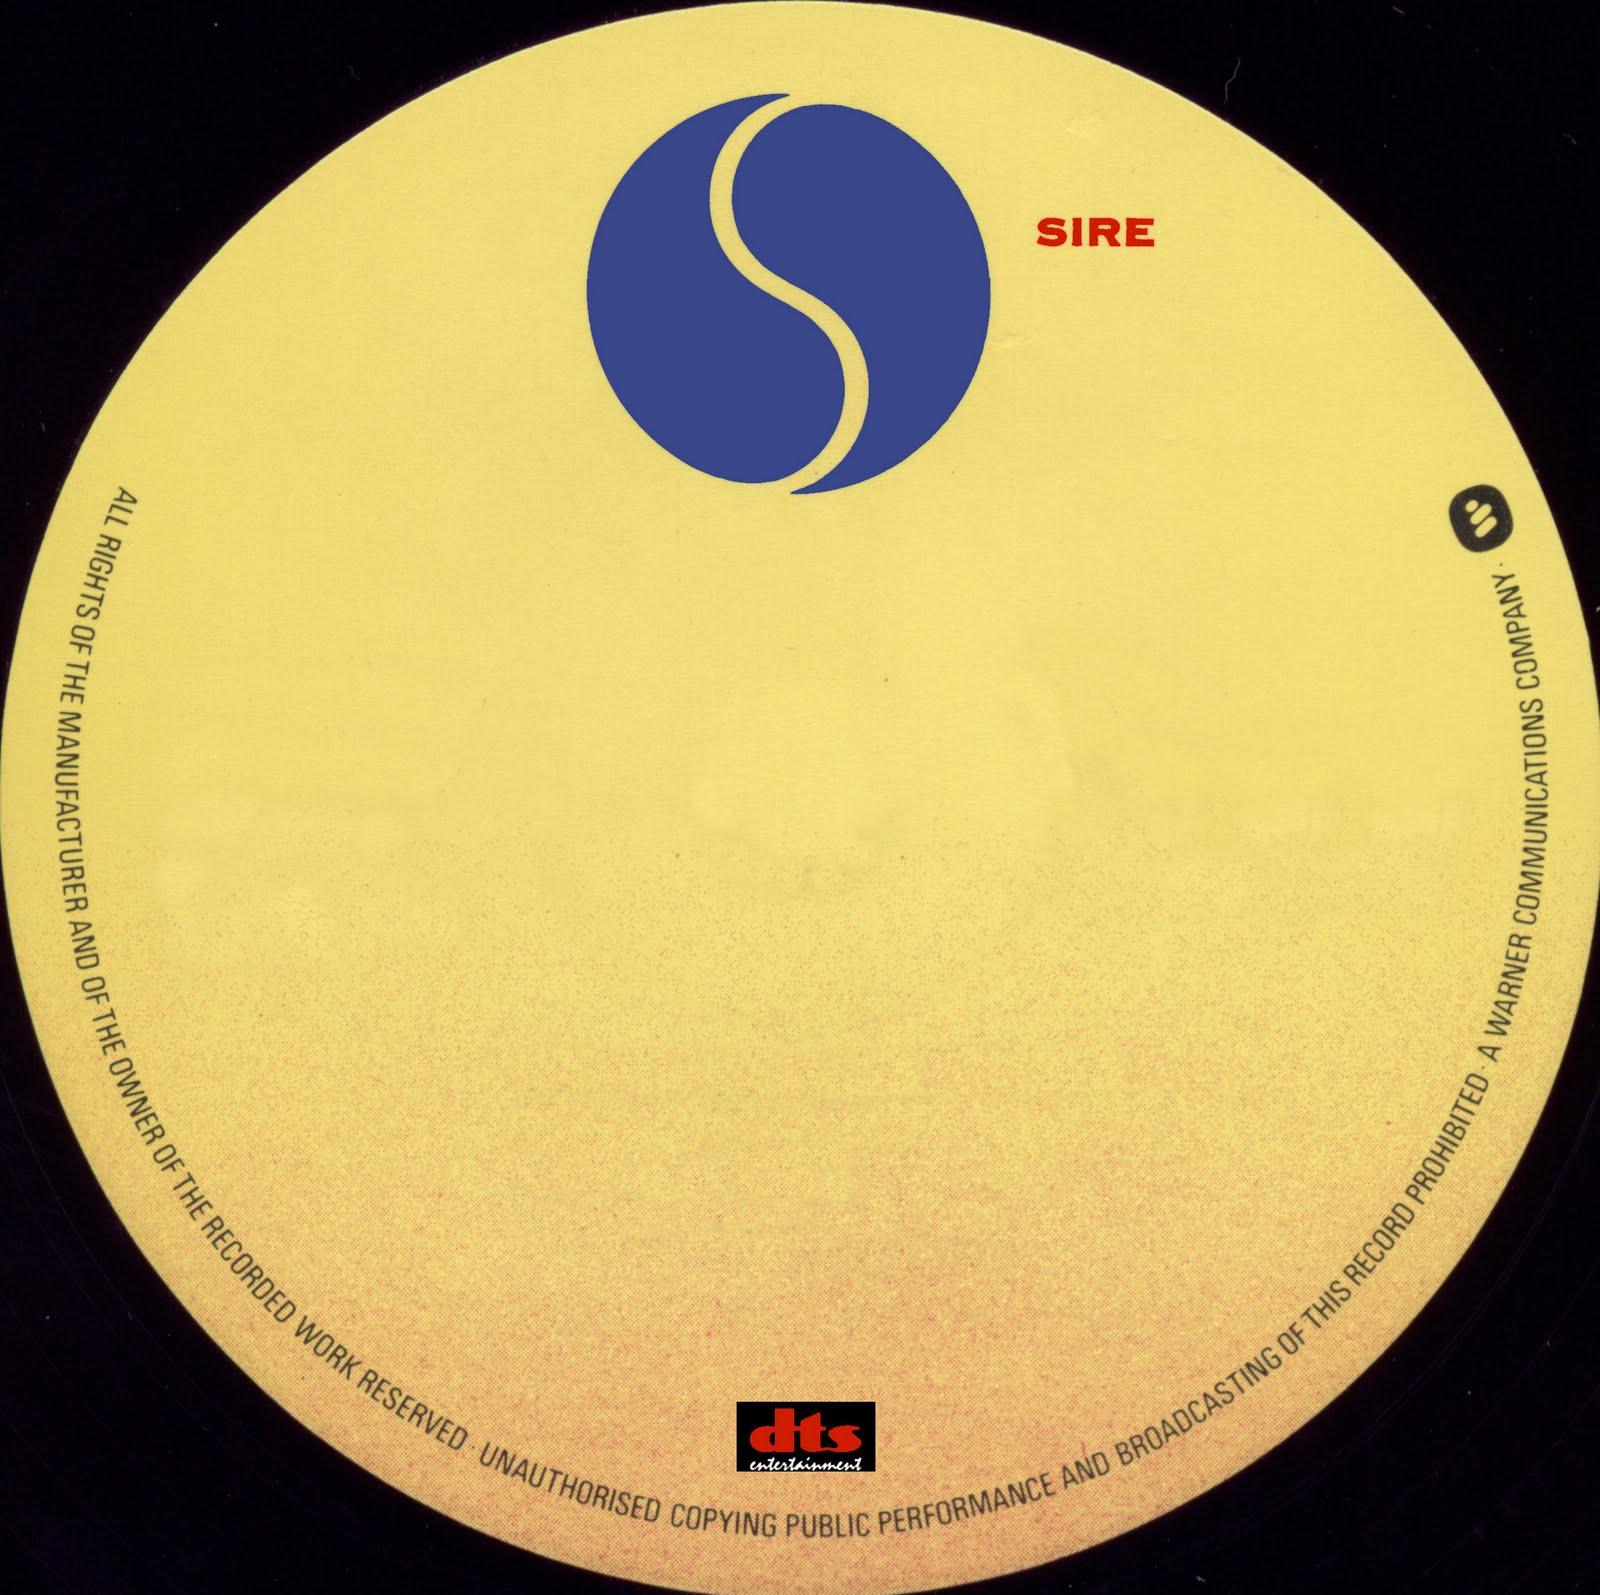 lampu mercury: Talking Heads Complete DTS (7DTS-CD)